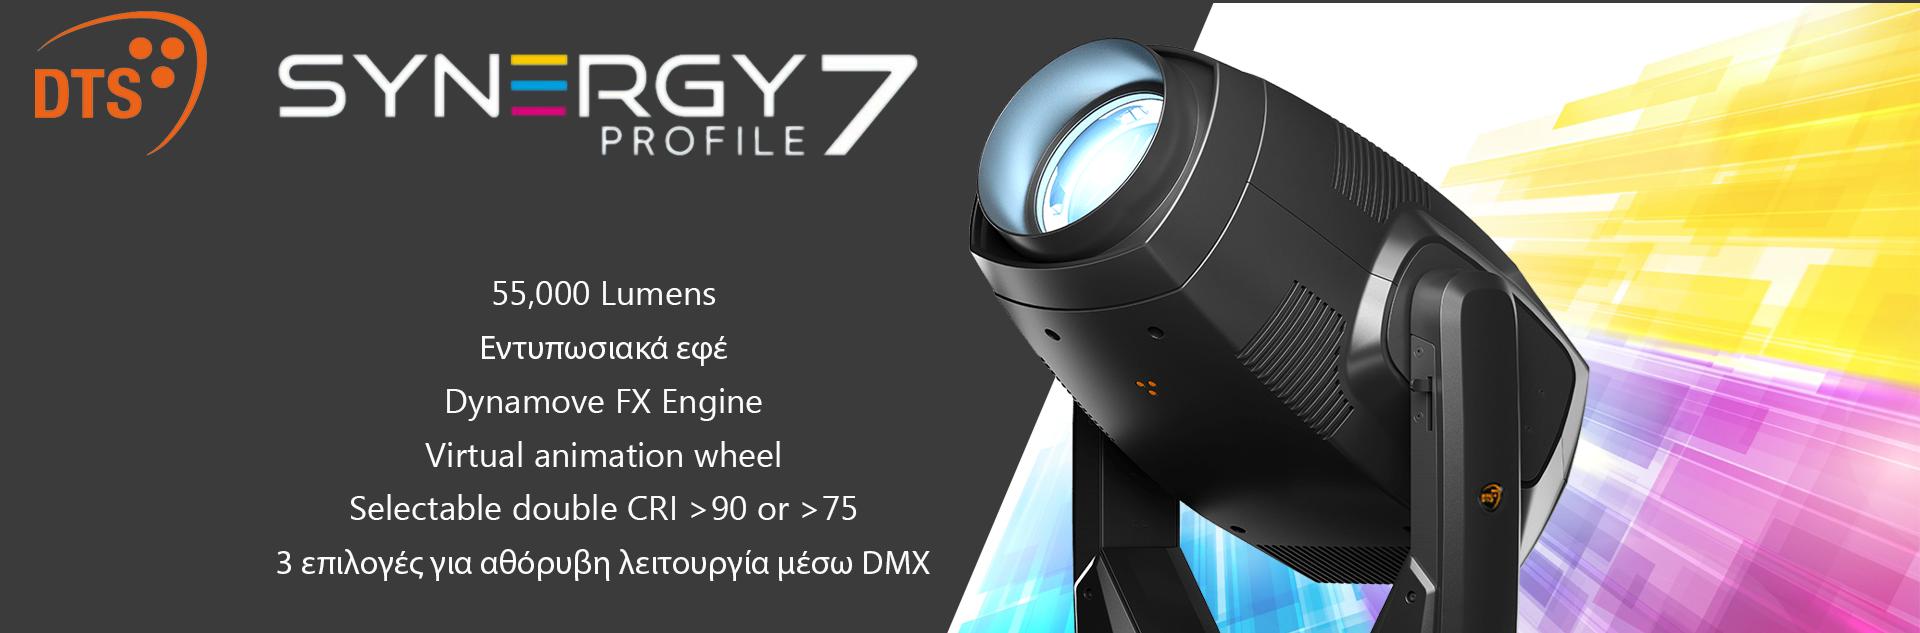 DTS Lighting Synergy 7 Profile